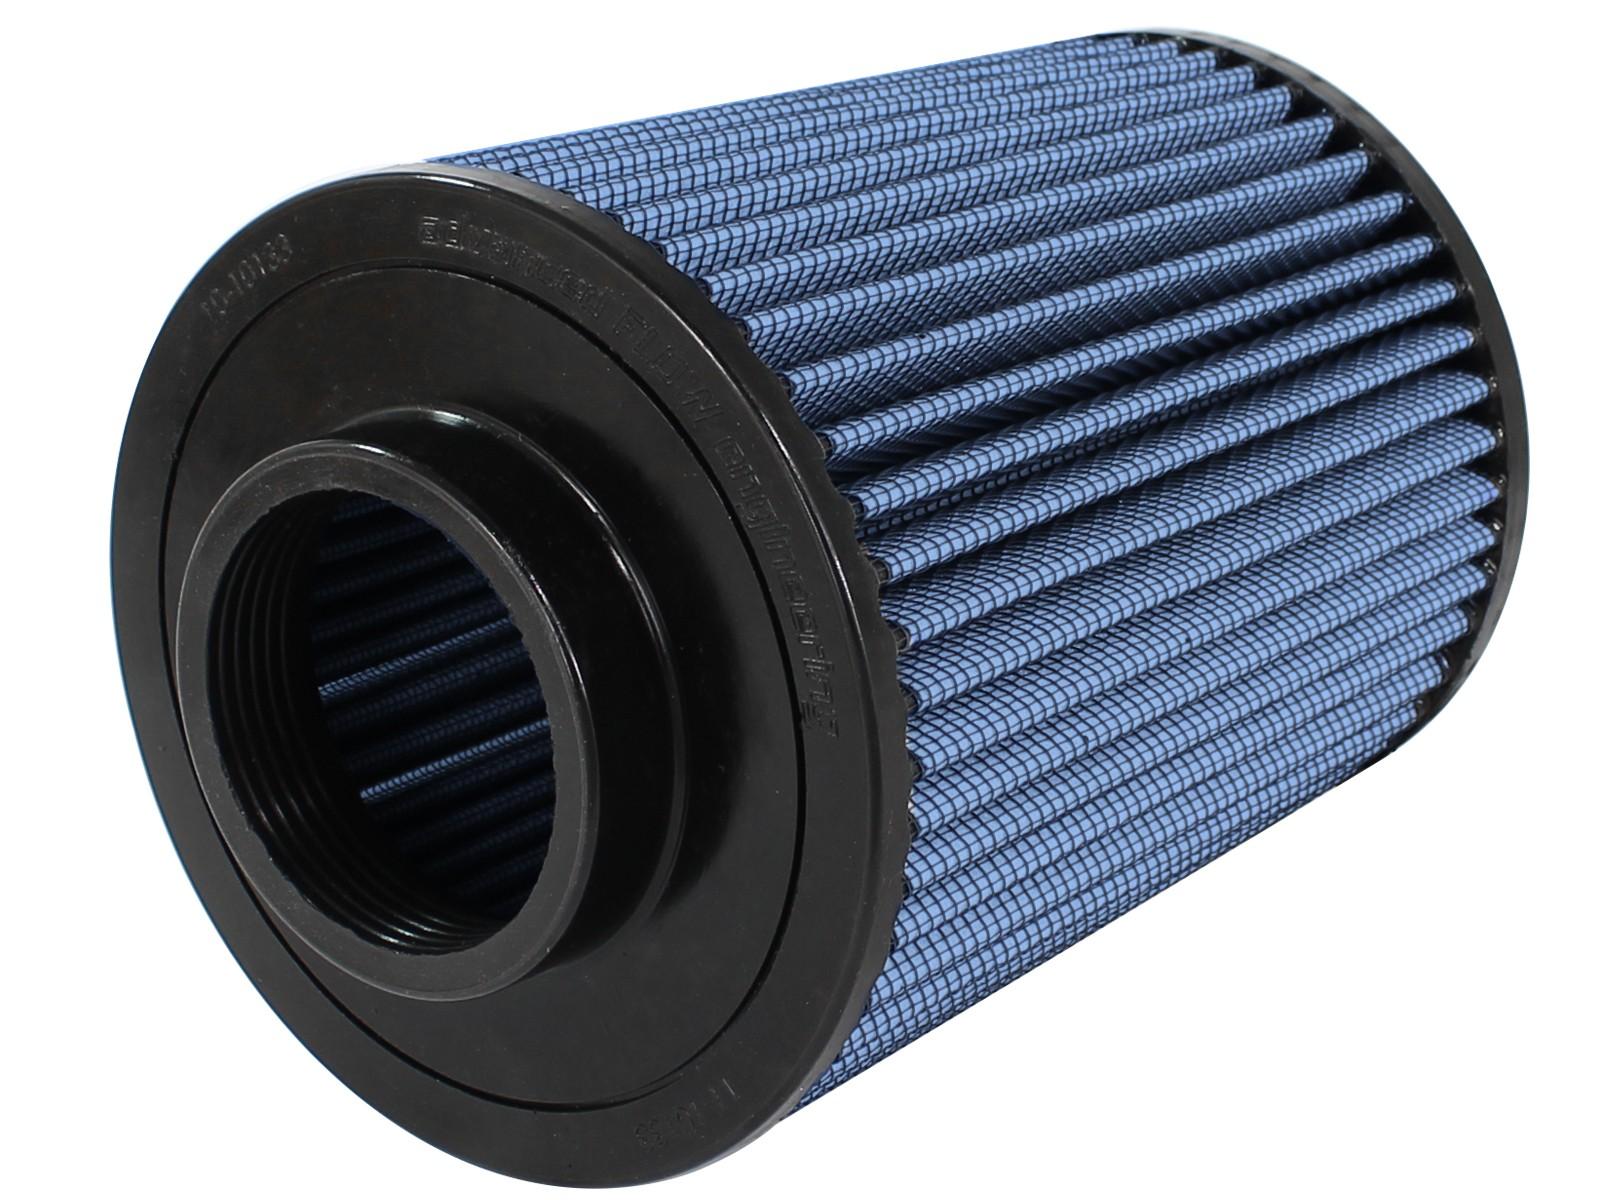 aFe Power 10-10133 Magnum FLOW OER Pro 5R Air Filter for Ford Focus